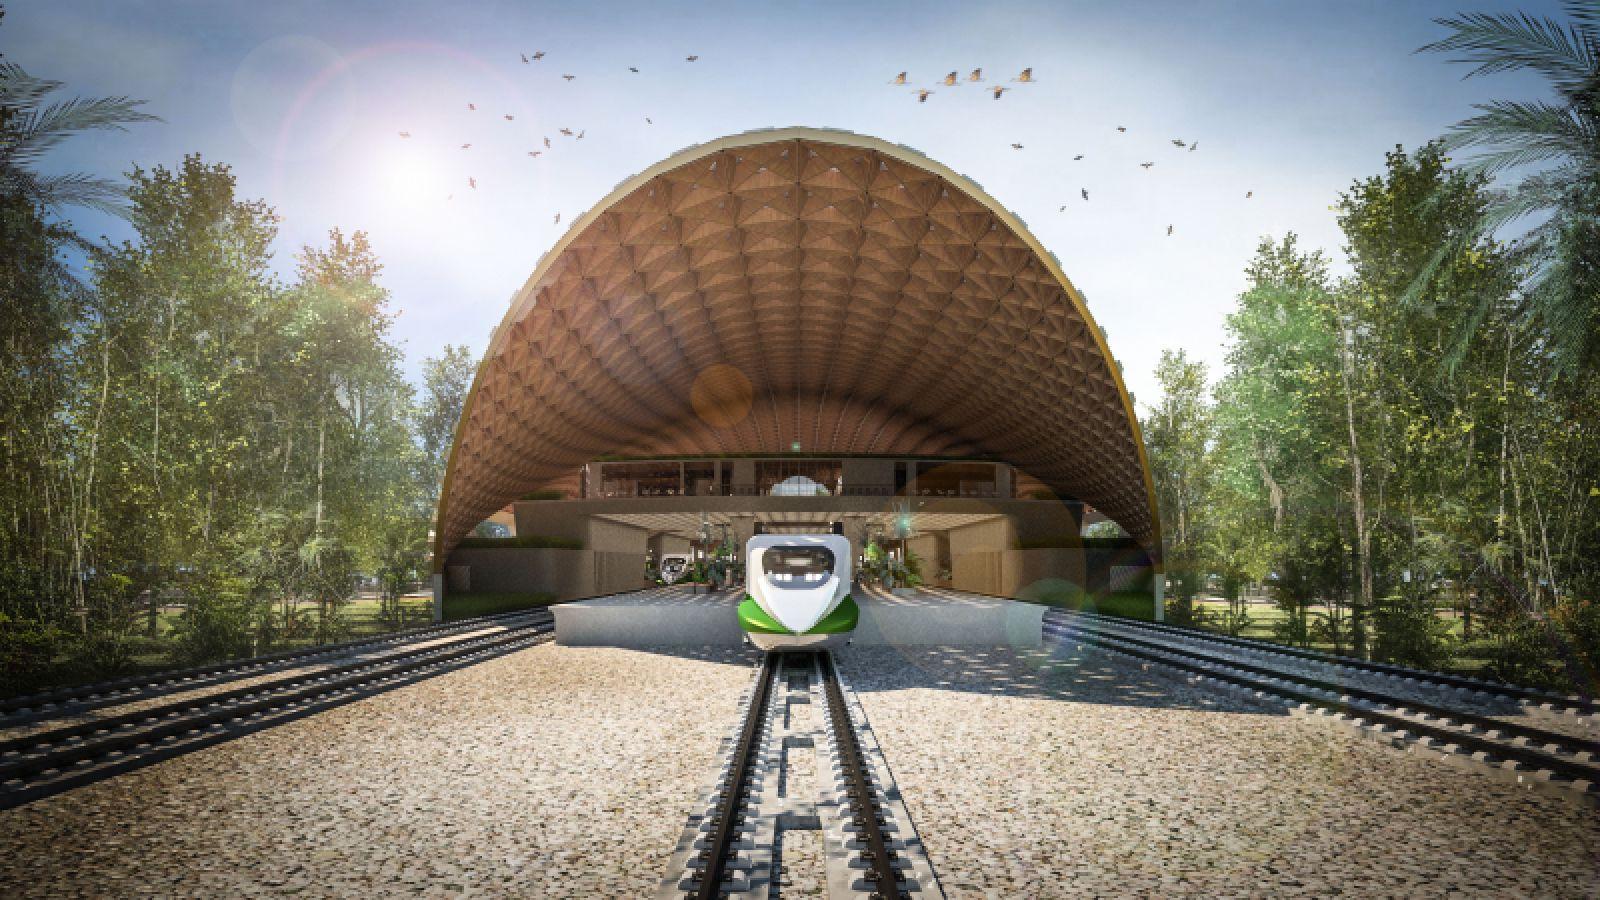 Tulum Train Station